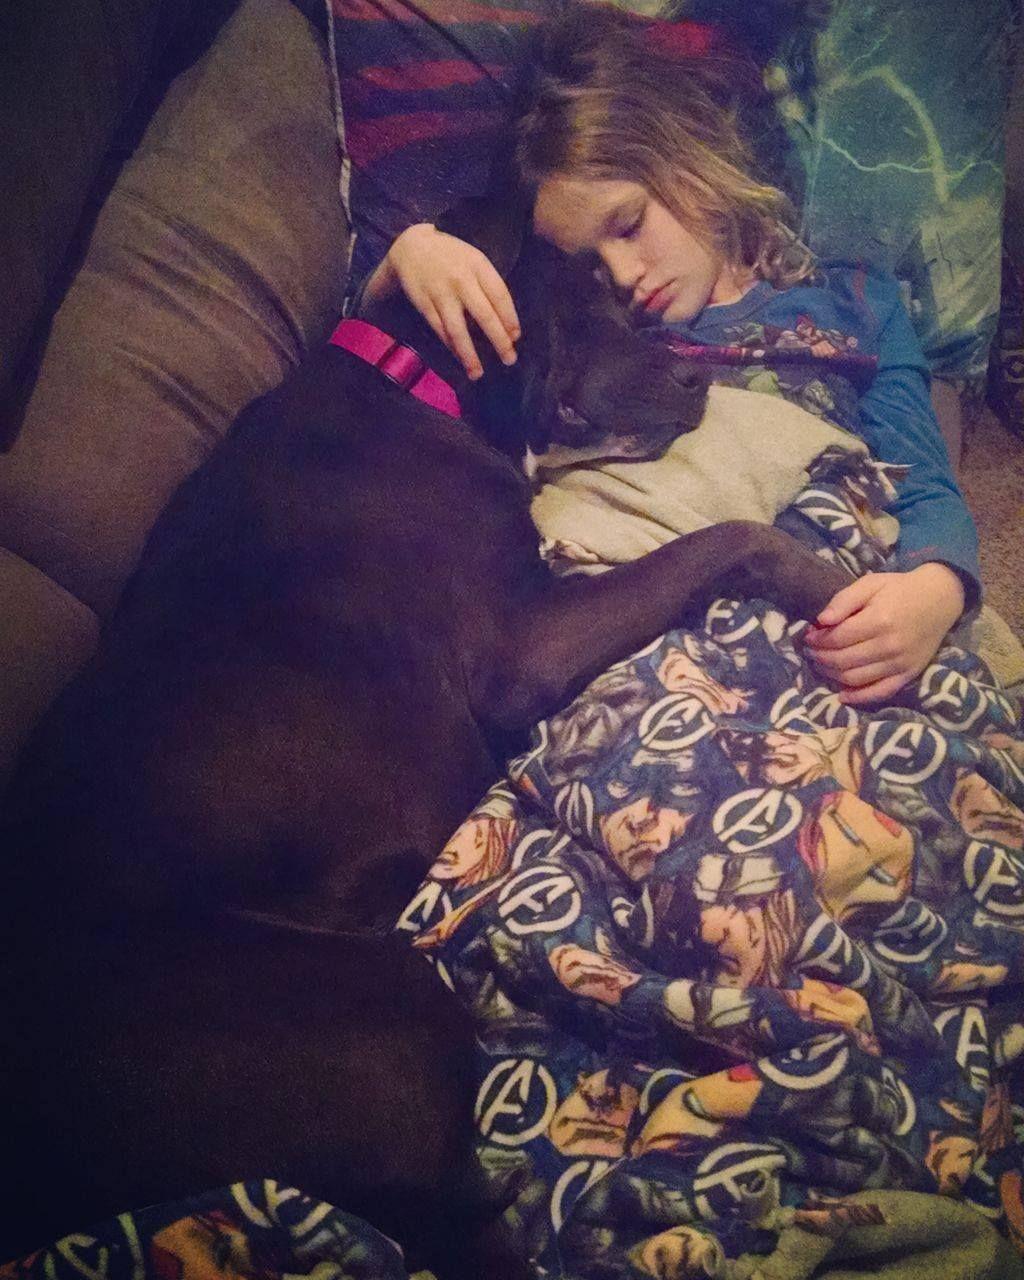 Just a boy and his dog http://ift.tt/2jISfjB